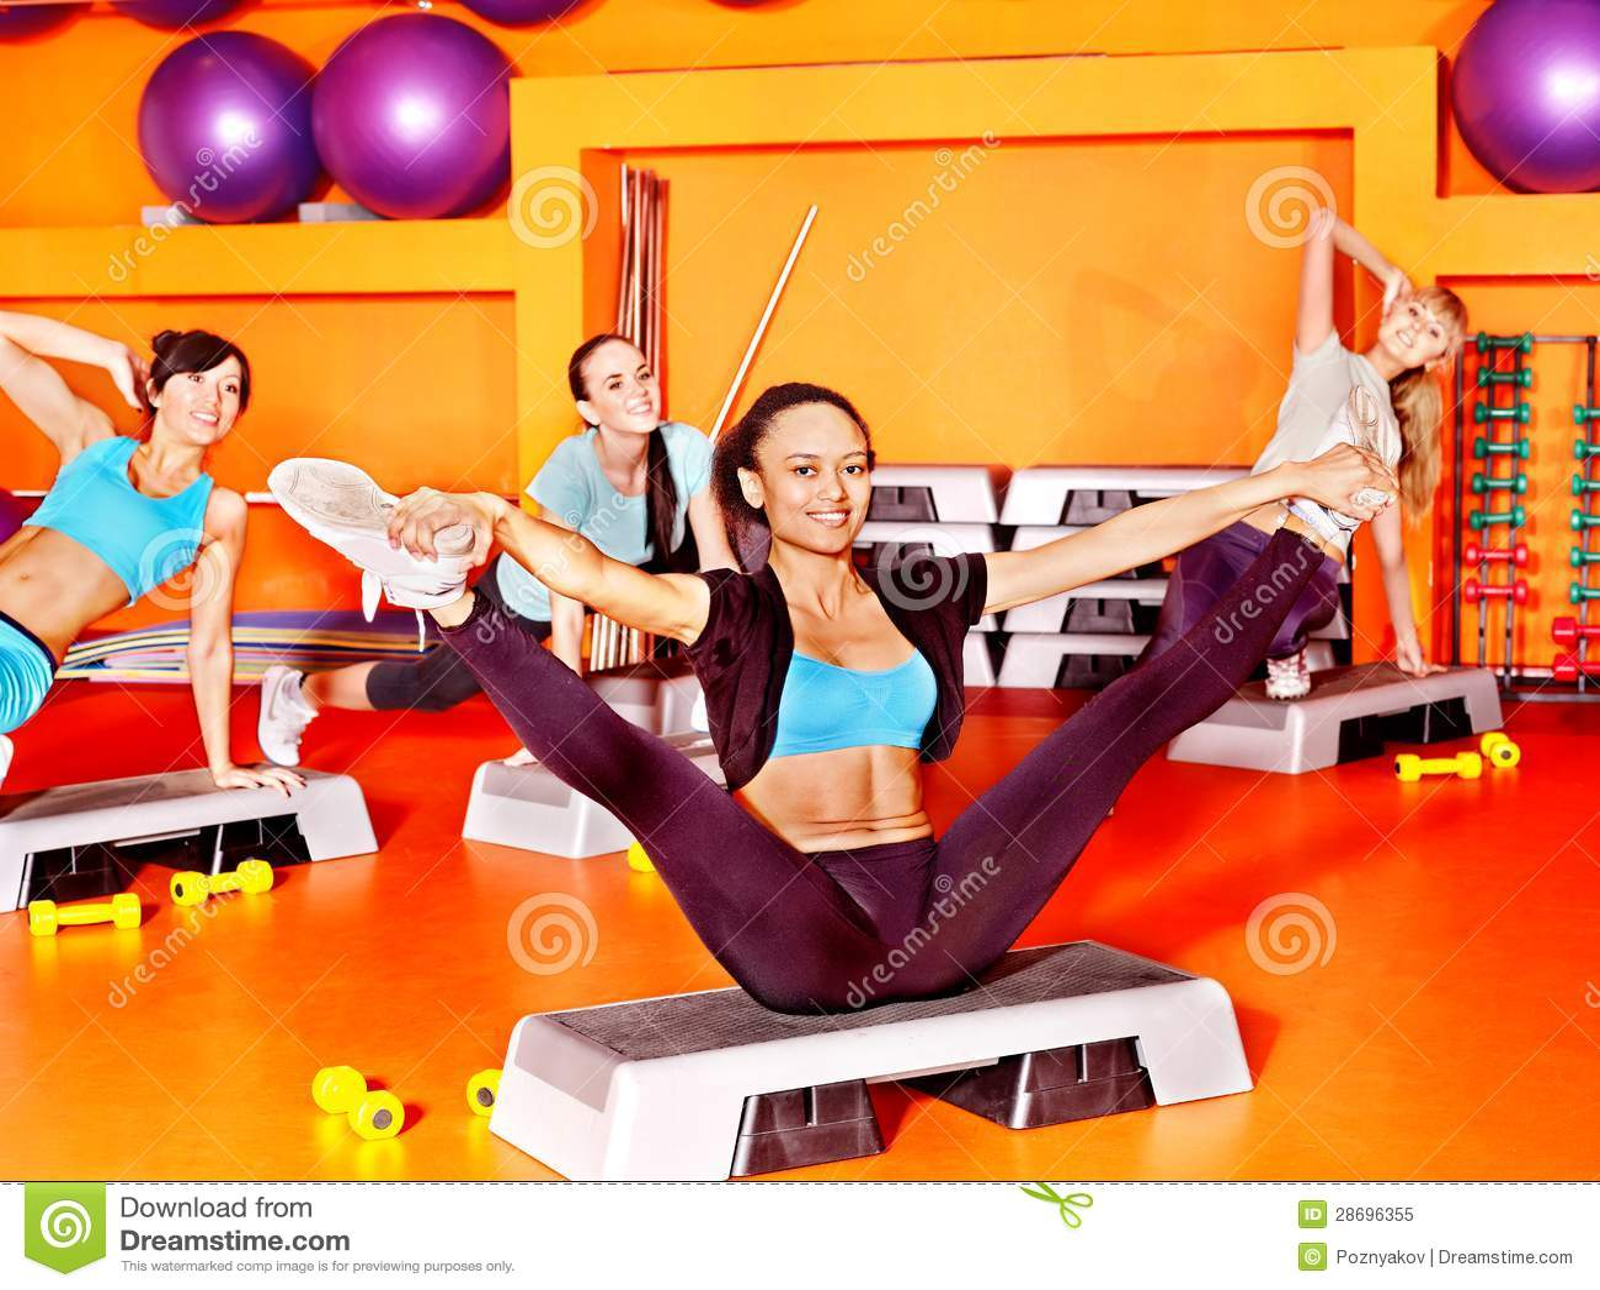 women in aerobics class stock image image of beauty 28696355